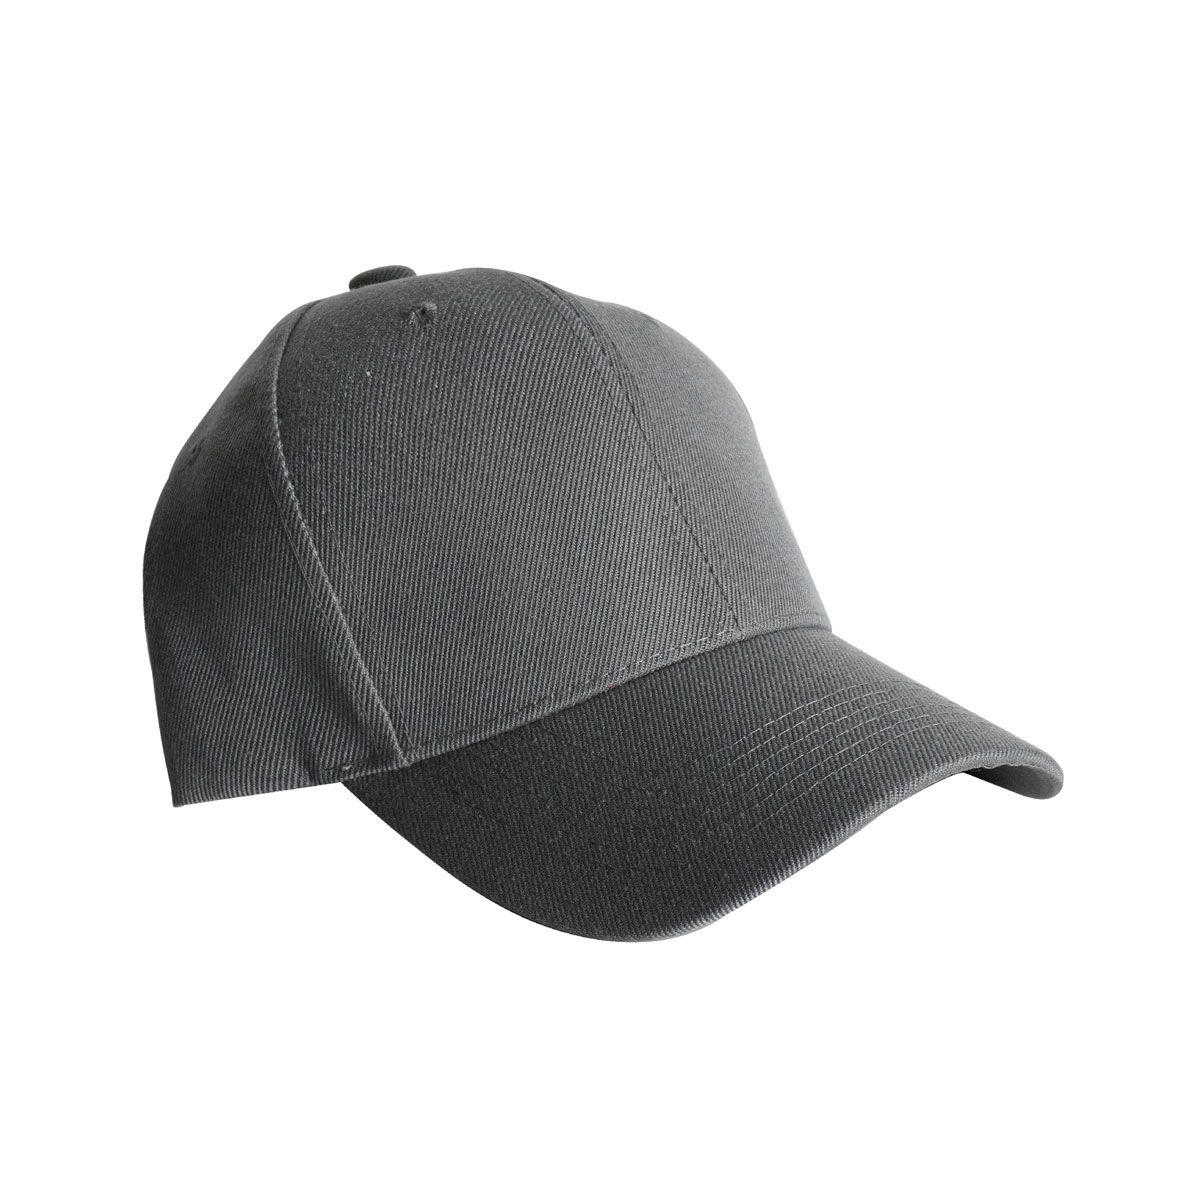 کلاه کپ مردانه گری مدل BC8GR -  - 1